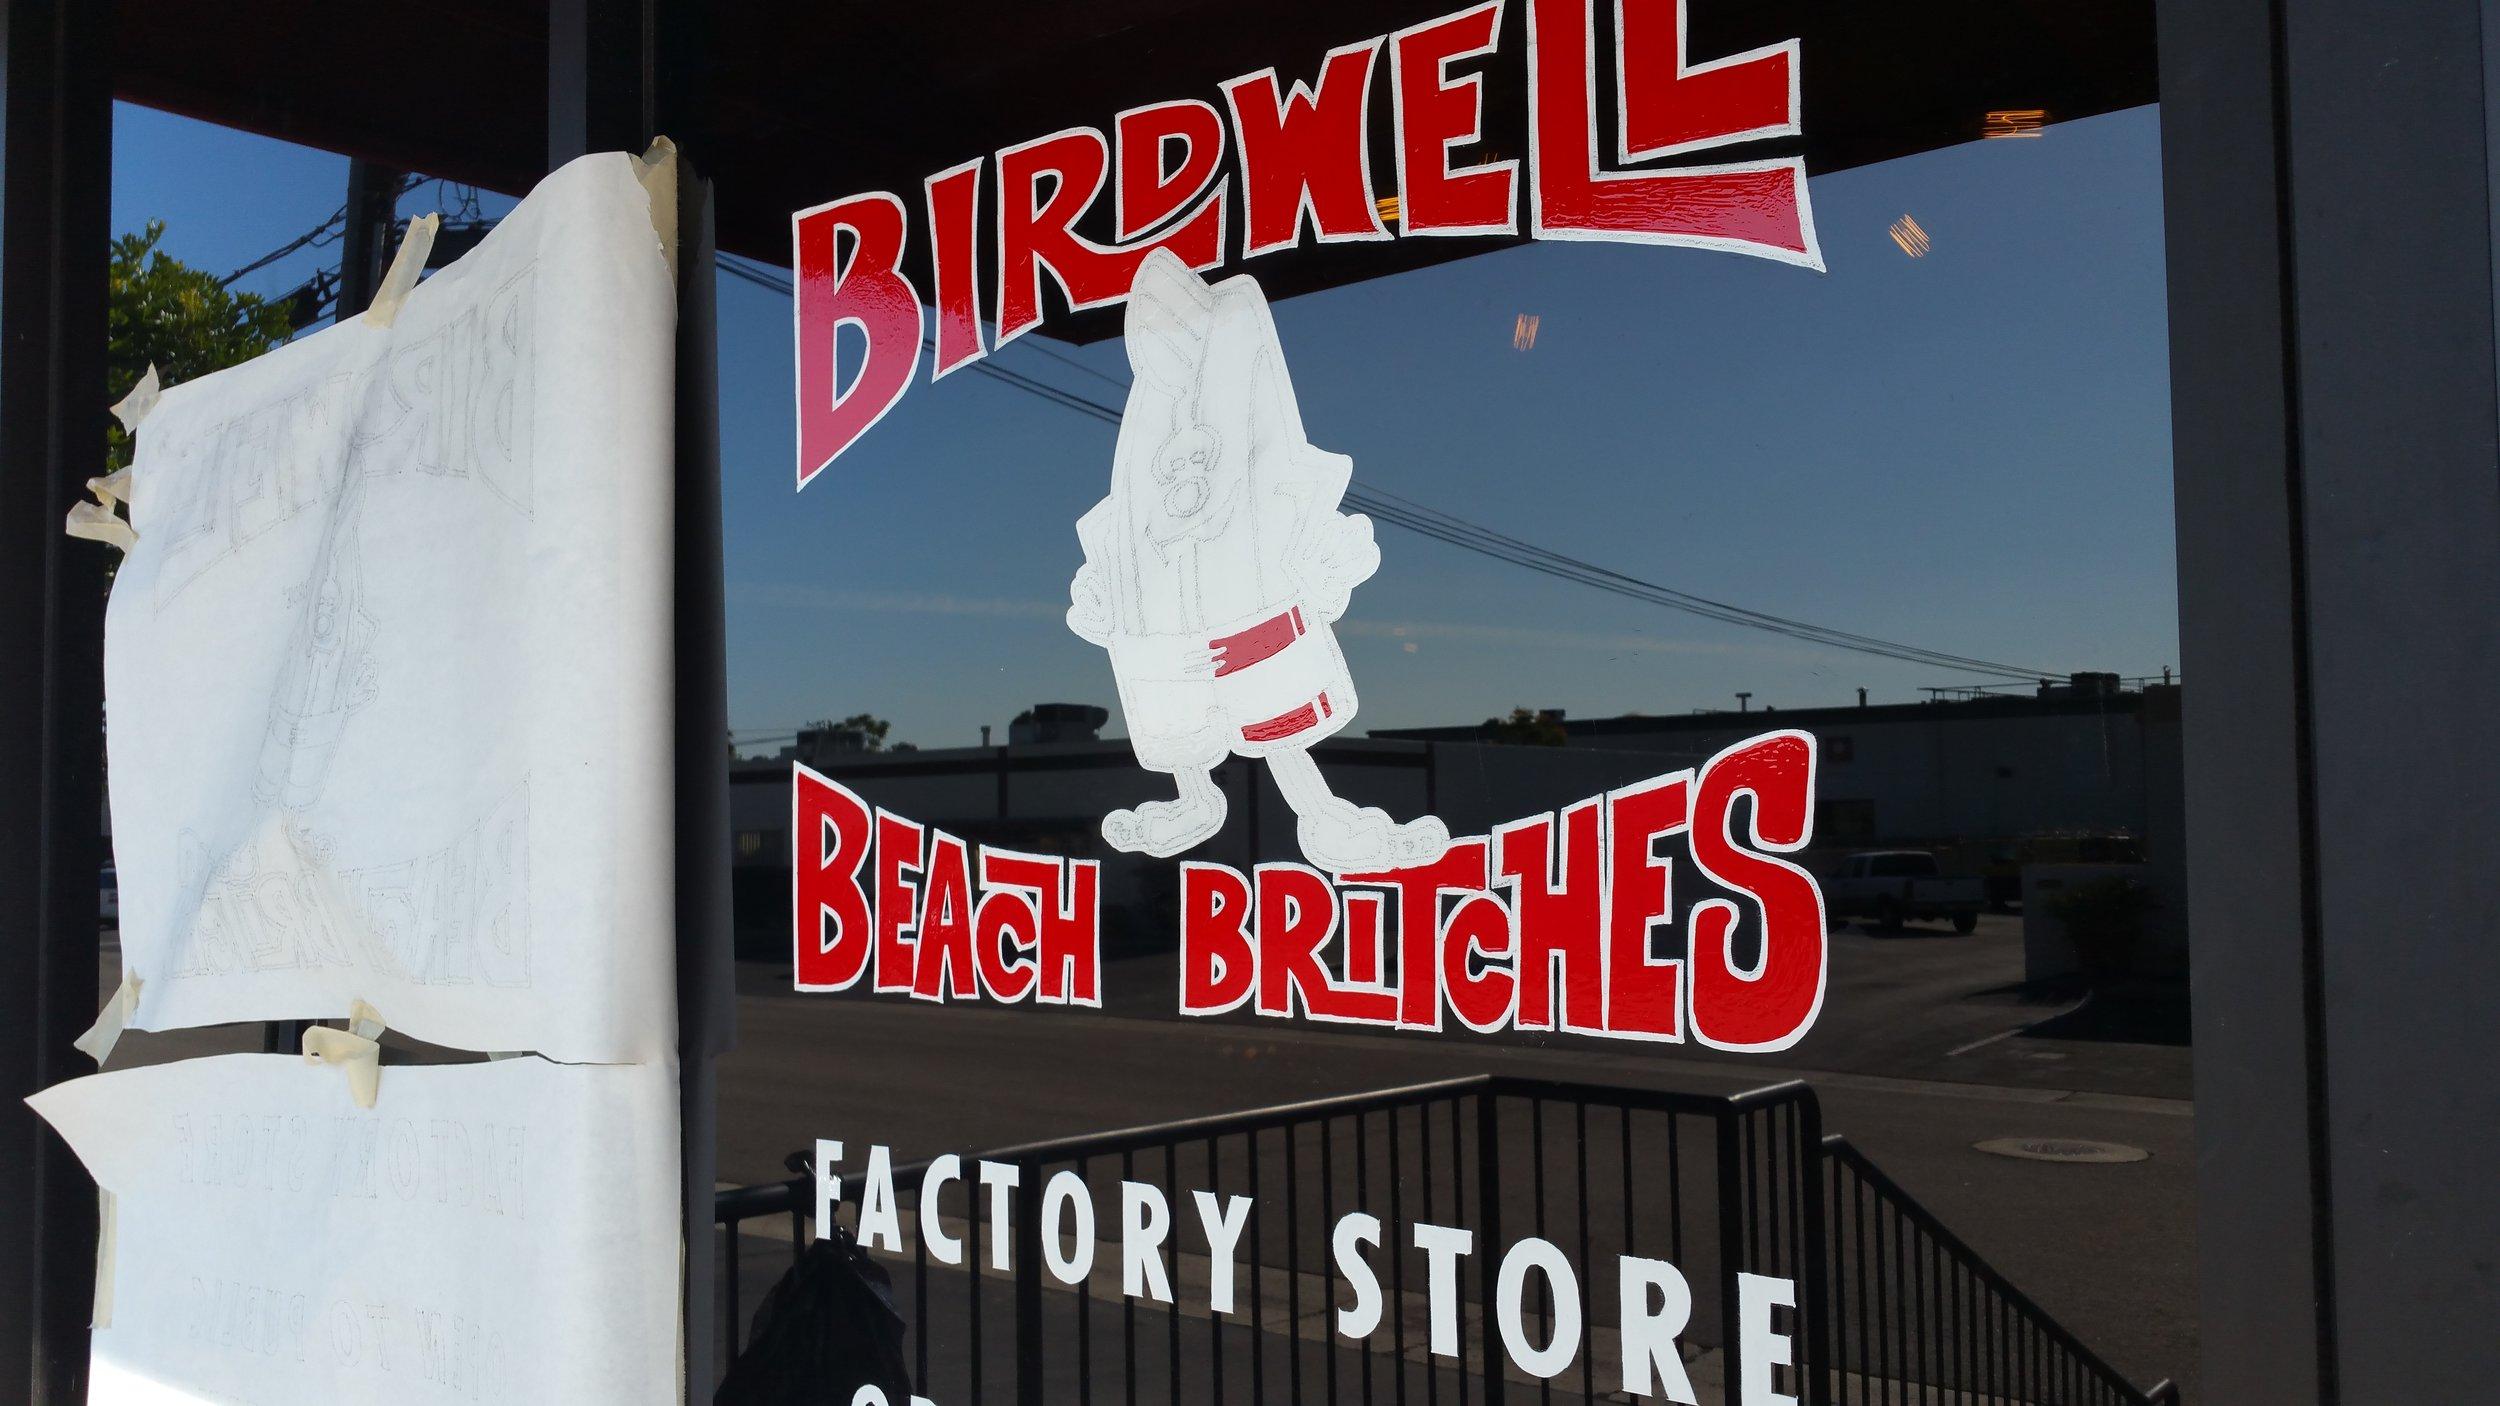 Birdwell Beach Britches Factory Store - in progress